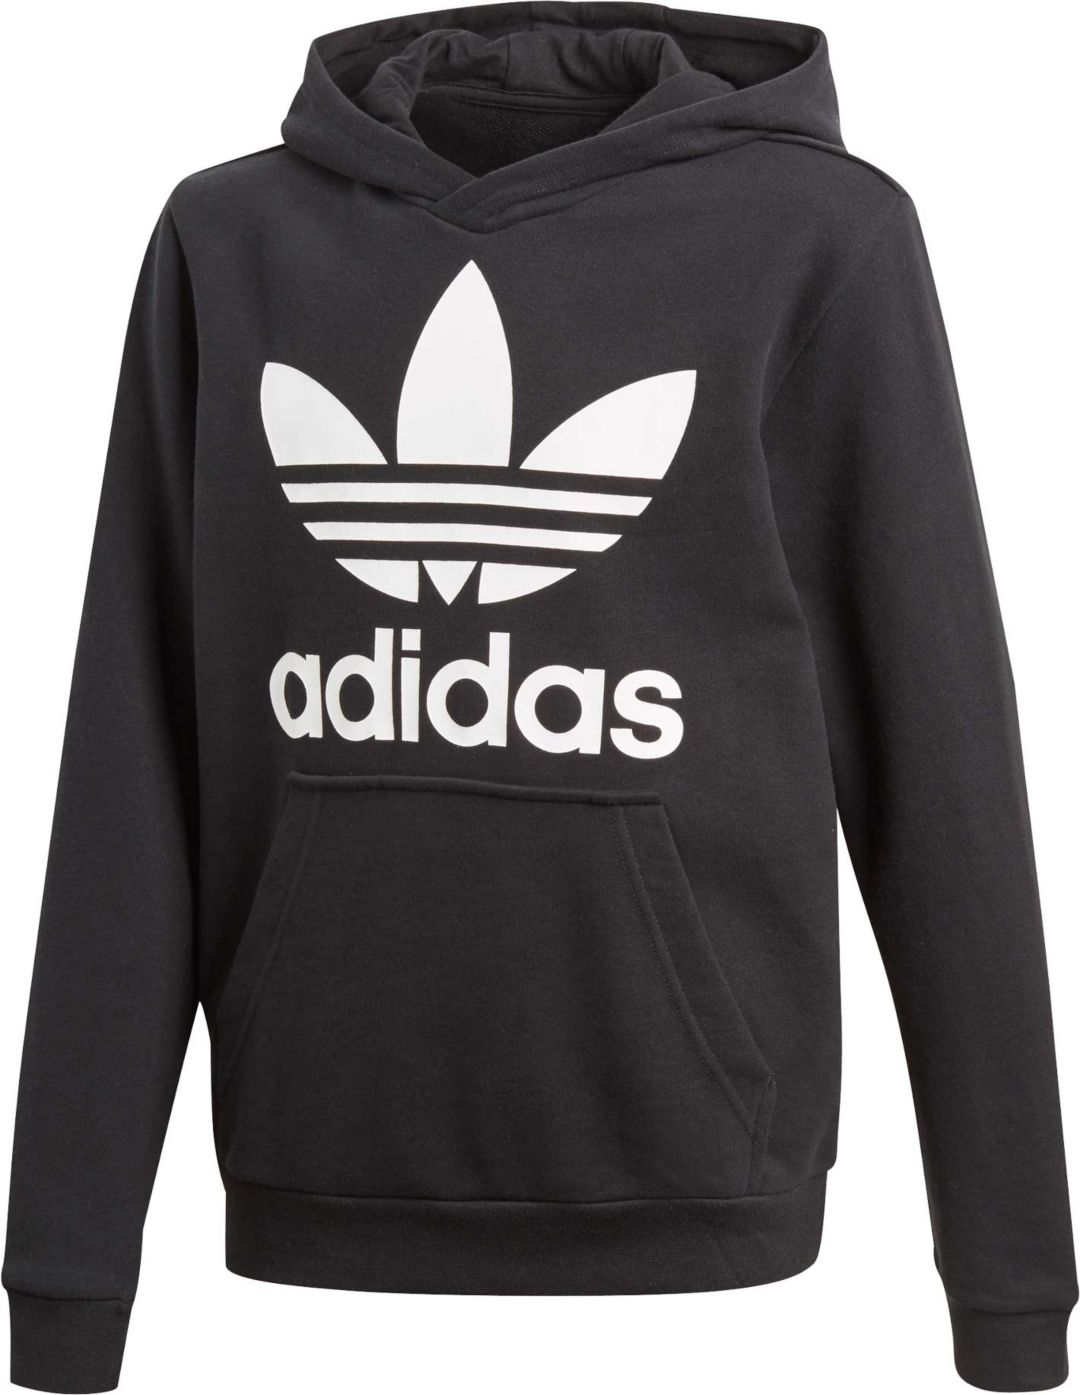 a8aa5eada adidas Originals Boys' Trefoil Hoodie | DICK'S Sporting Goods